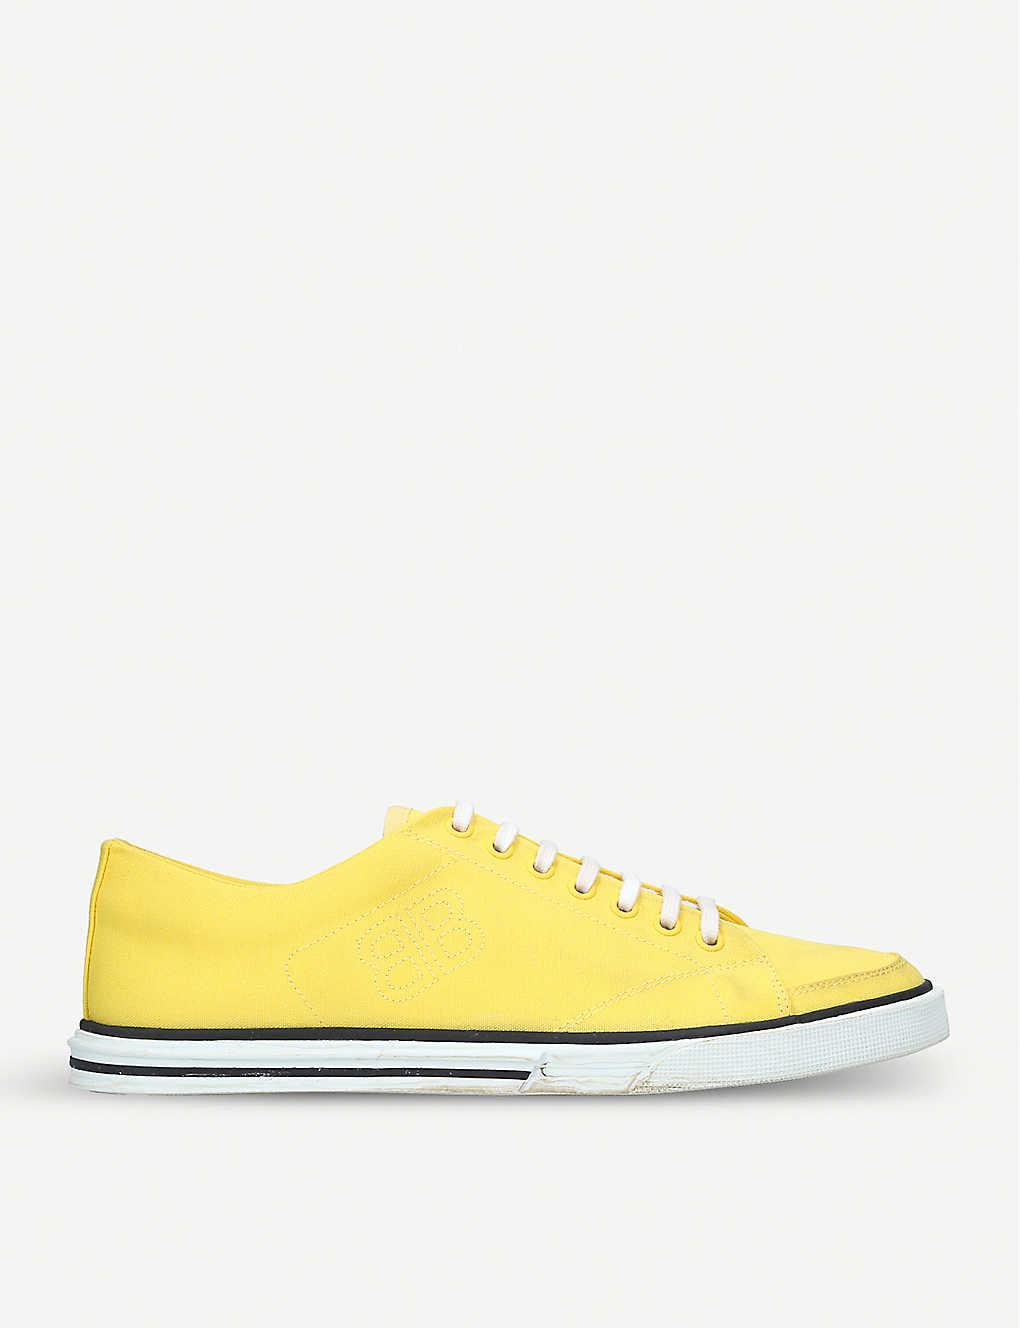 Balenciaga Match Canvas Sneakers D Island Shoes Motif England Mens Low Merah No Recent Searches